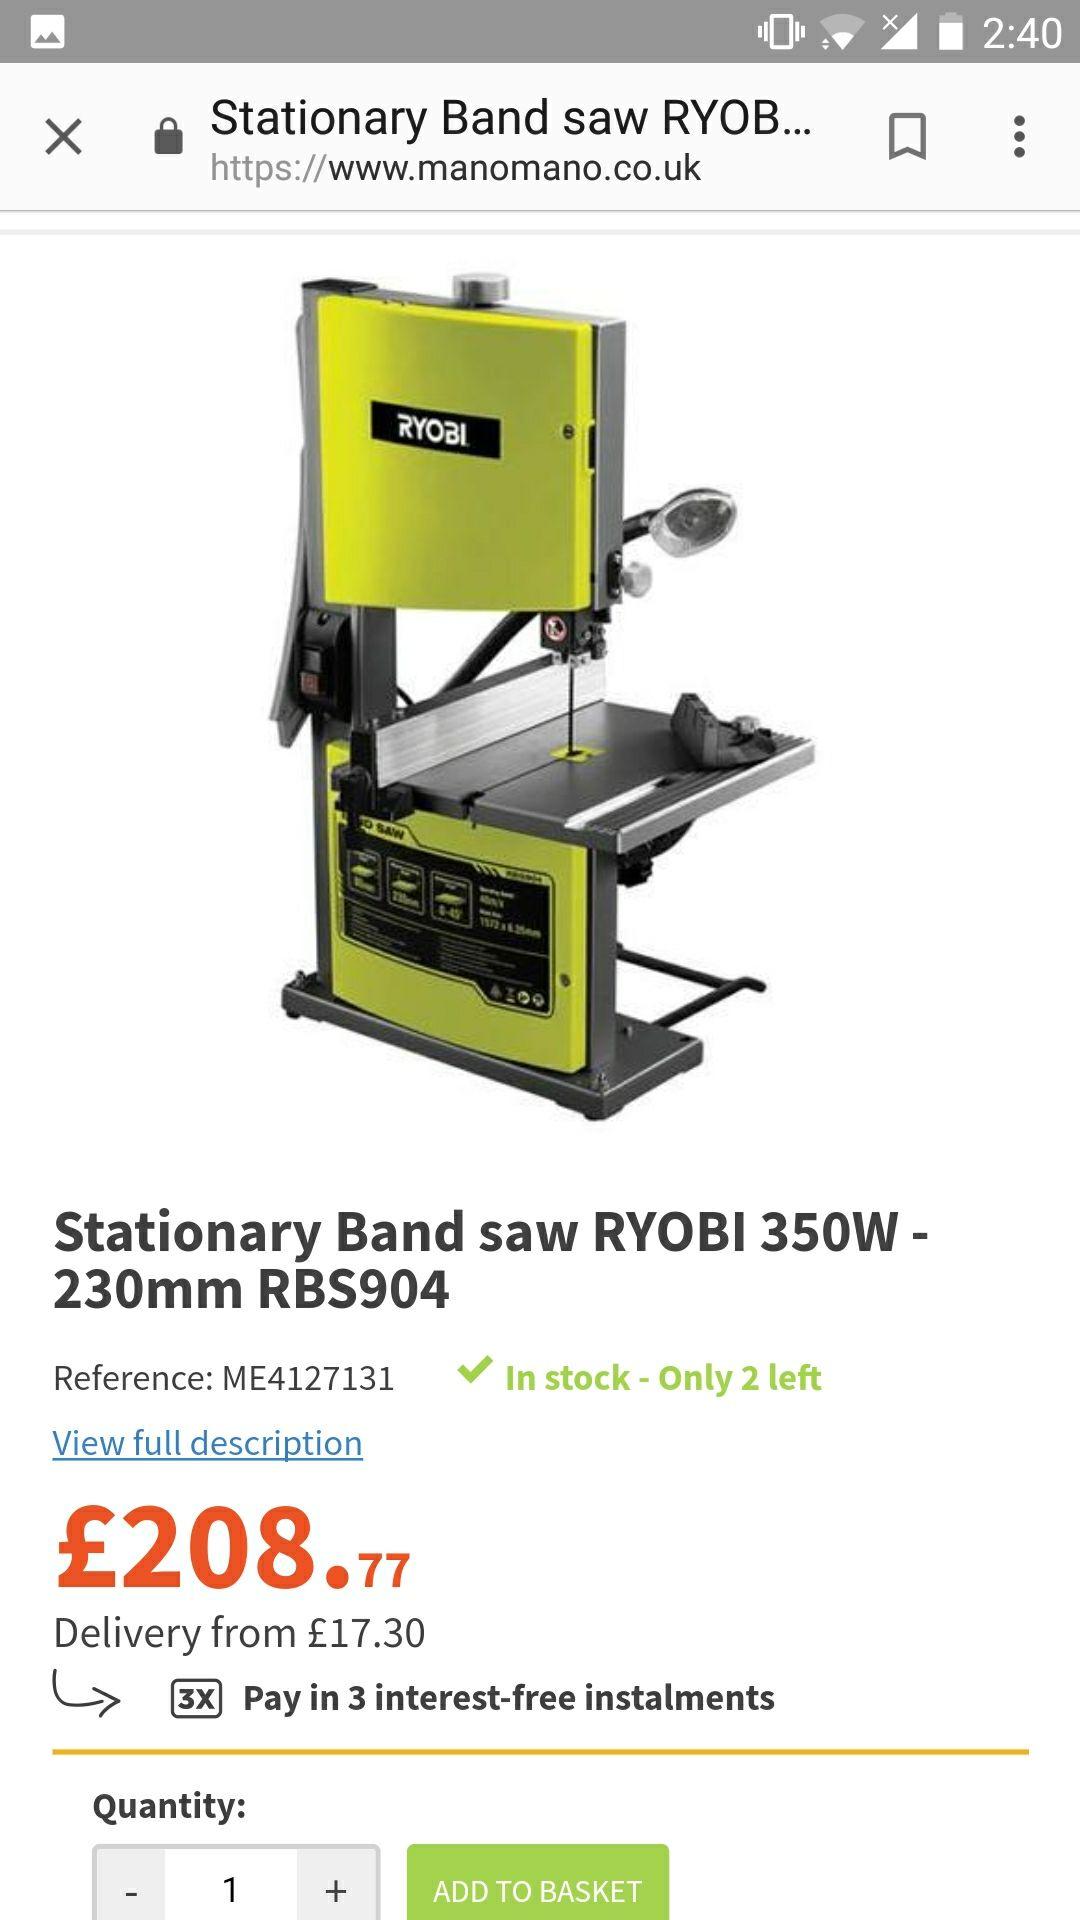 Bandsaw RYOBI 350W  230mm RBS904 (2 in stock) - £208.77 @ Manomano